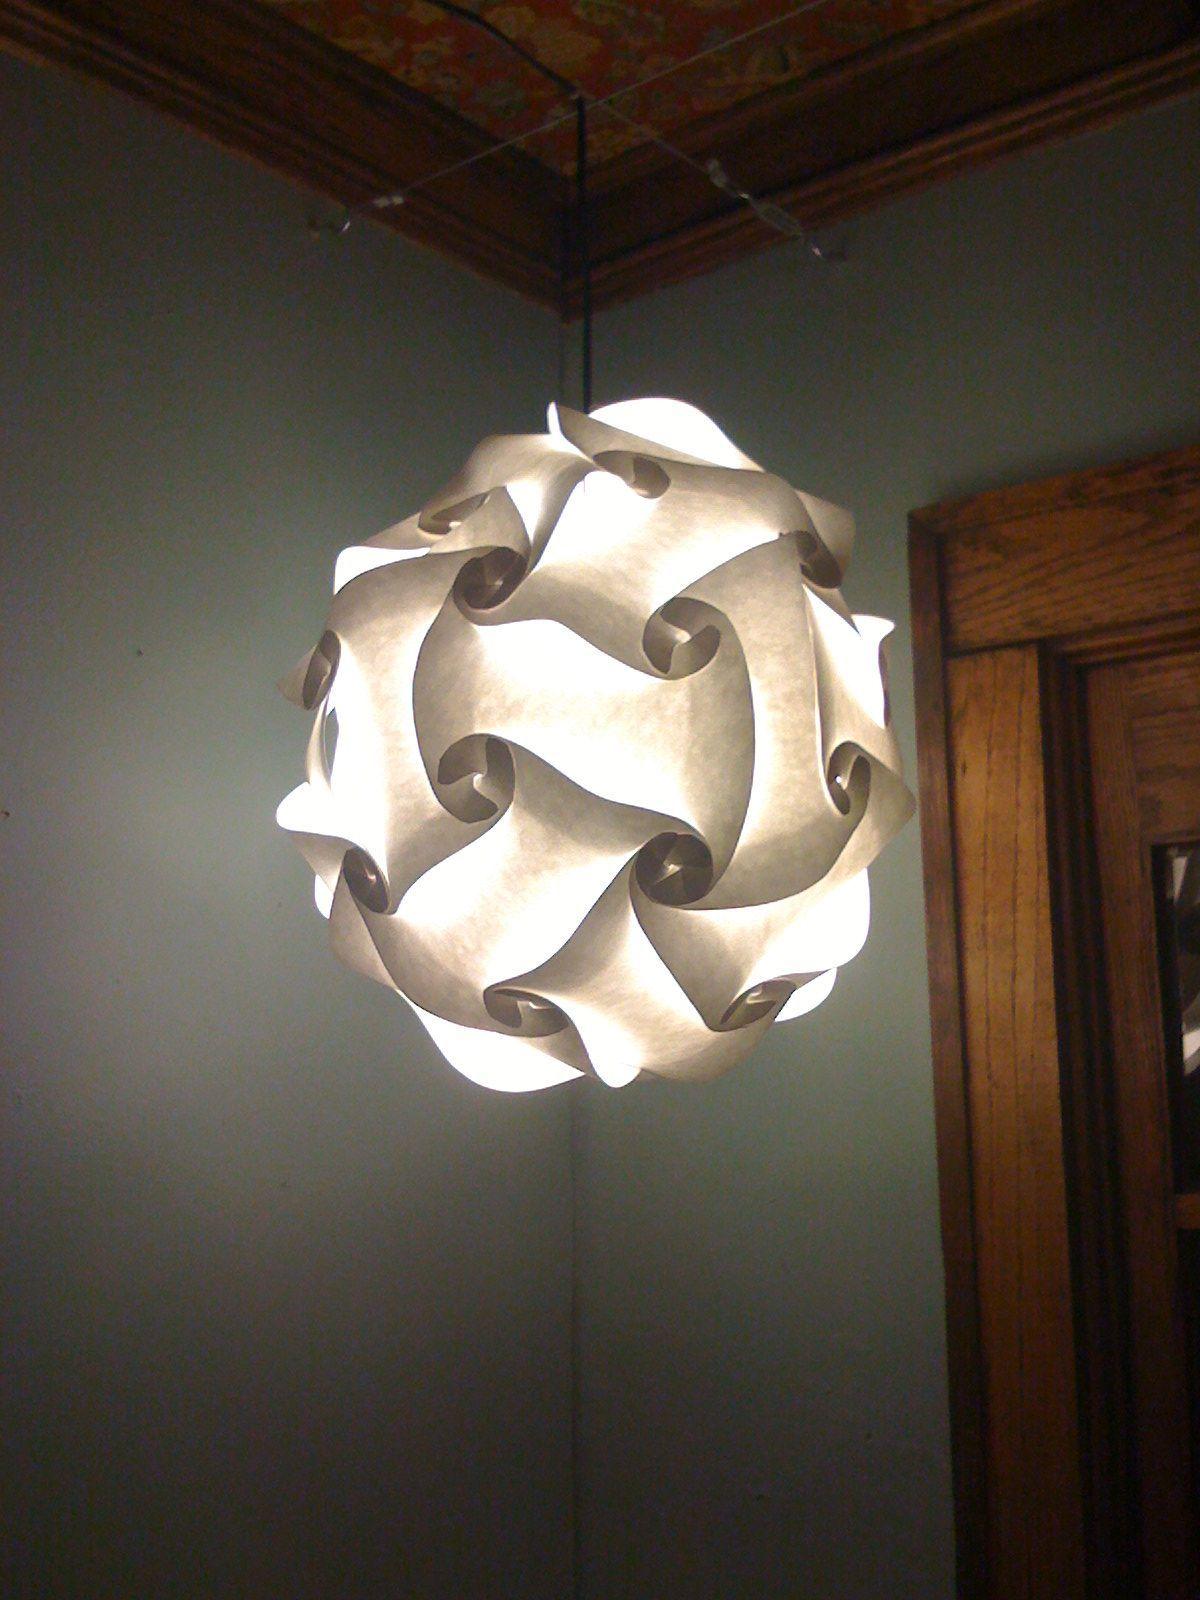 Interior surprisingly really cool lamps like you tell funny jokes HLMOJKA